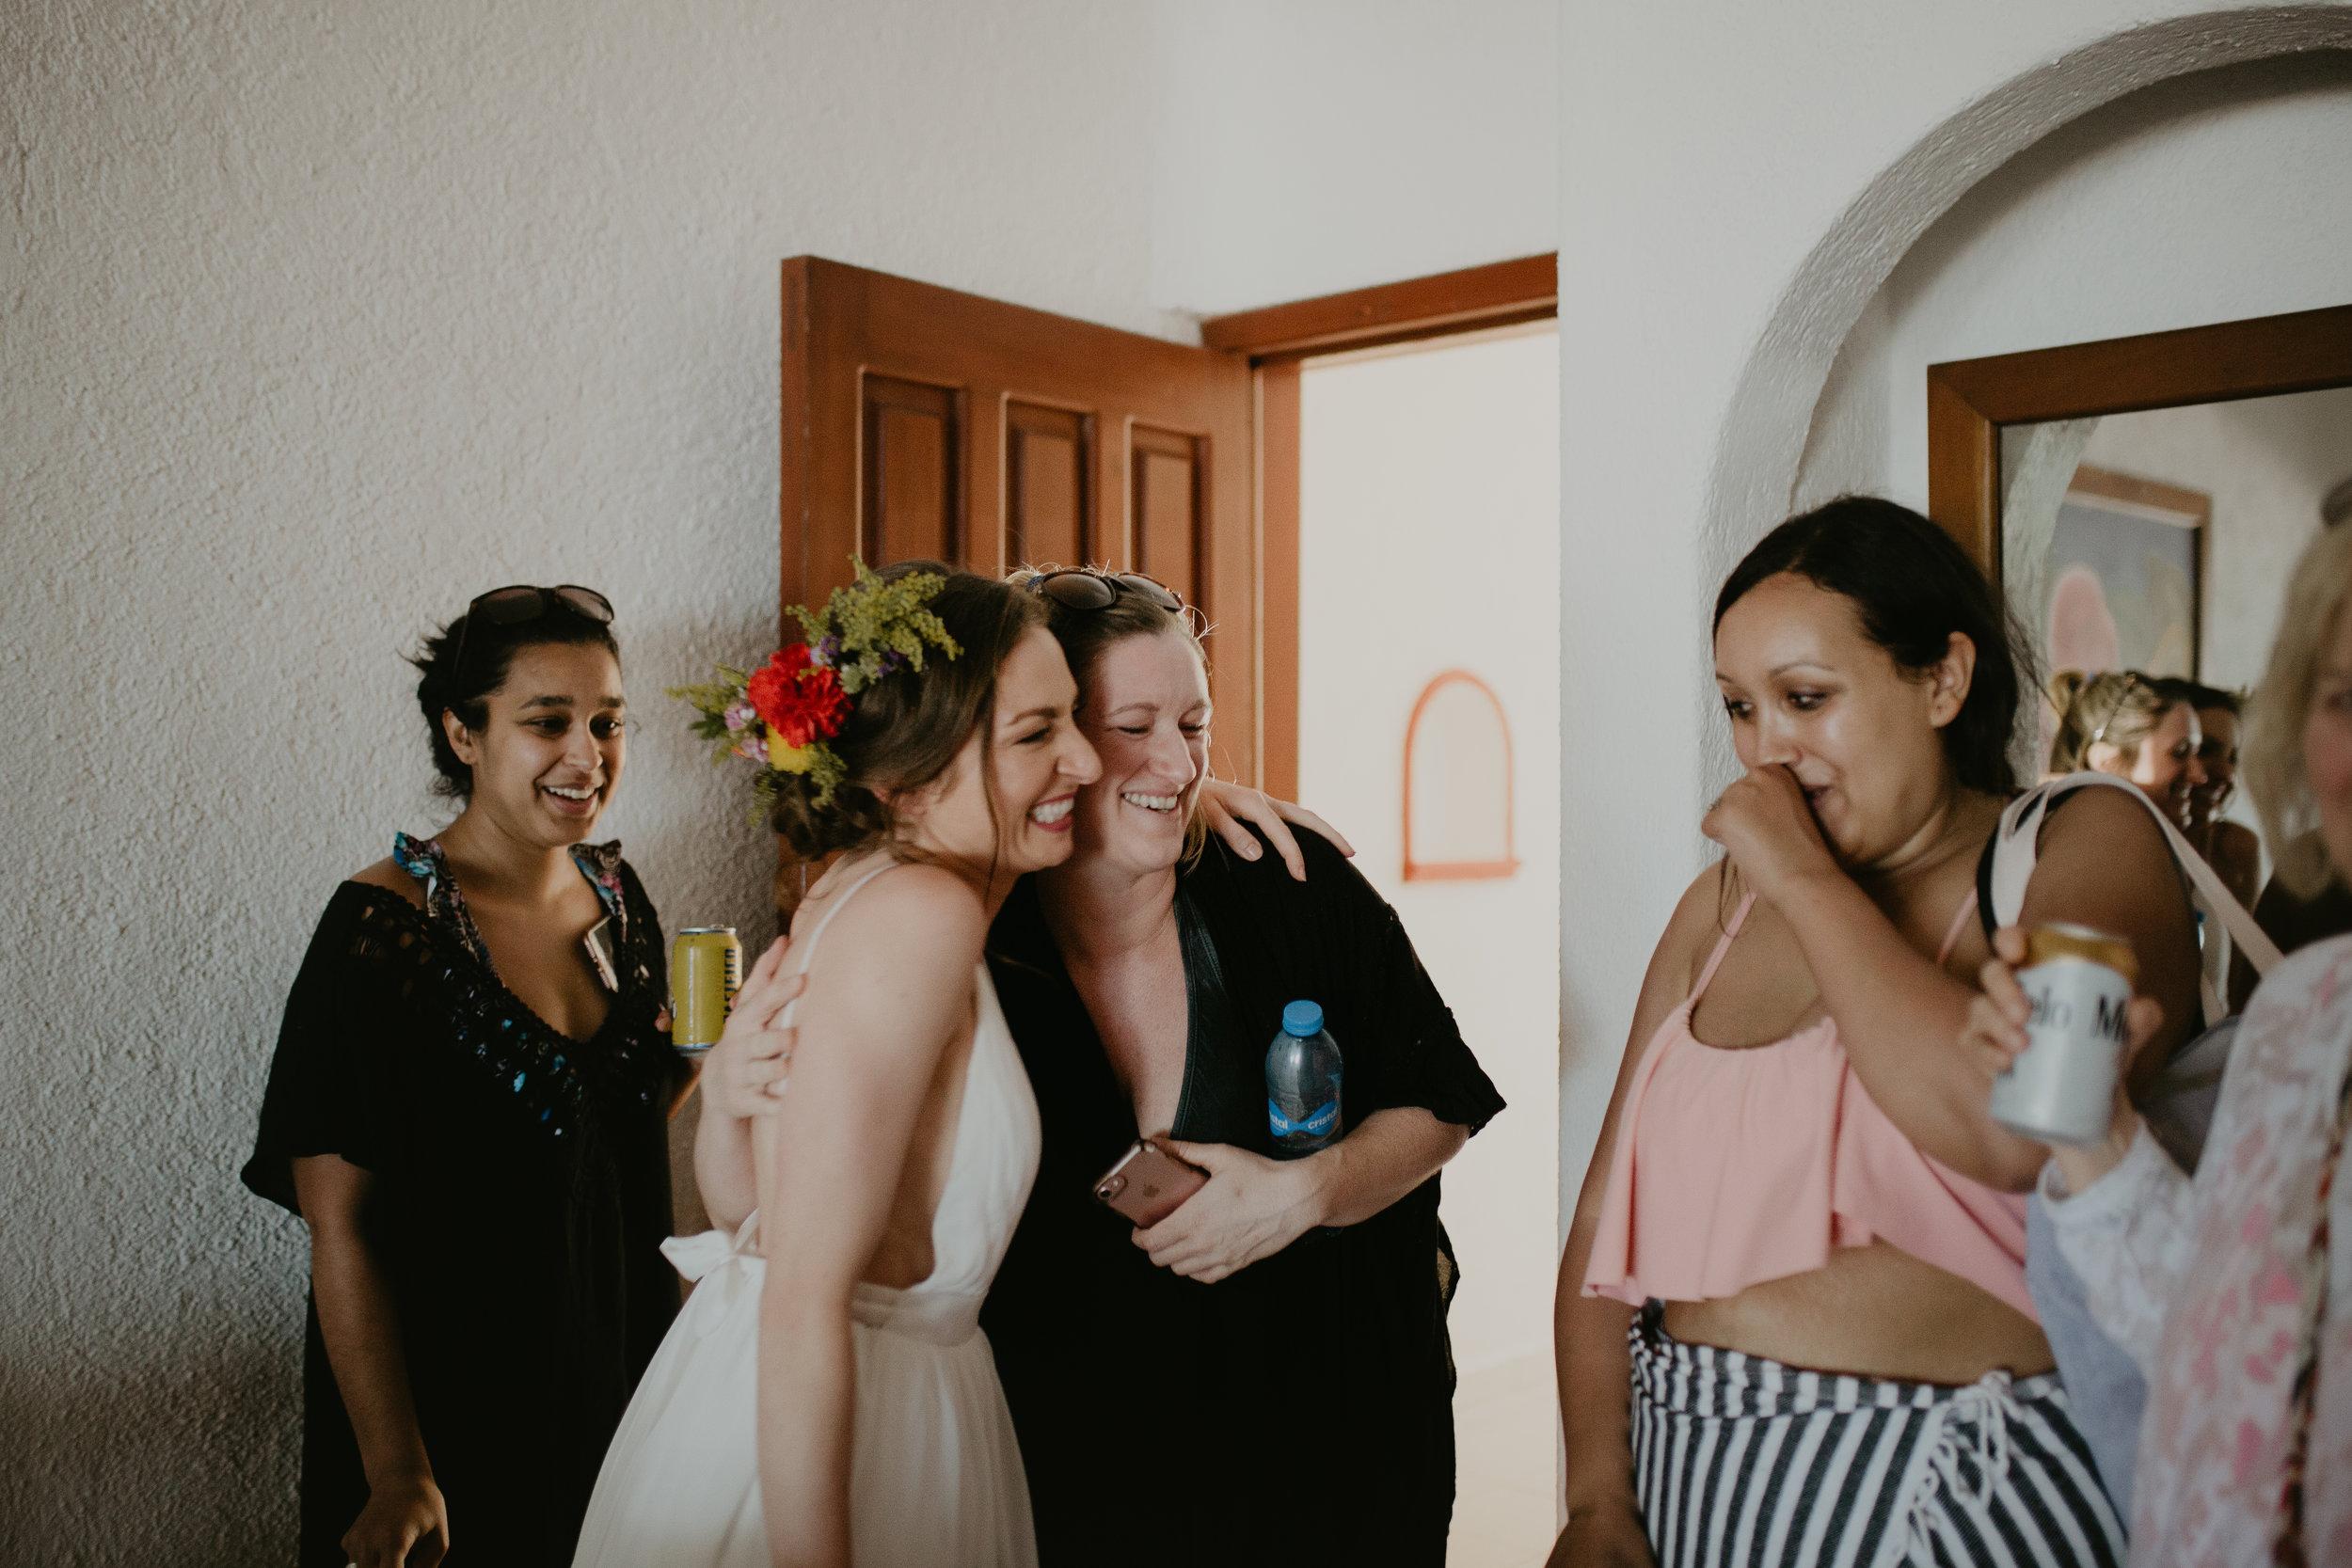 Nicole-Daacke-Photography-beachfront-akumal-destionation-wedding-tulum-mexico-elopement-photographer-destination-wedding-inspiration-sunset-champagne-pop-boho-bride-ocean-tropical-bohemian-tulum-wedding-photos-107.jpg